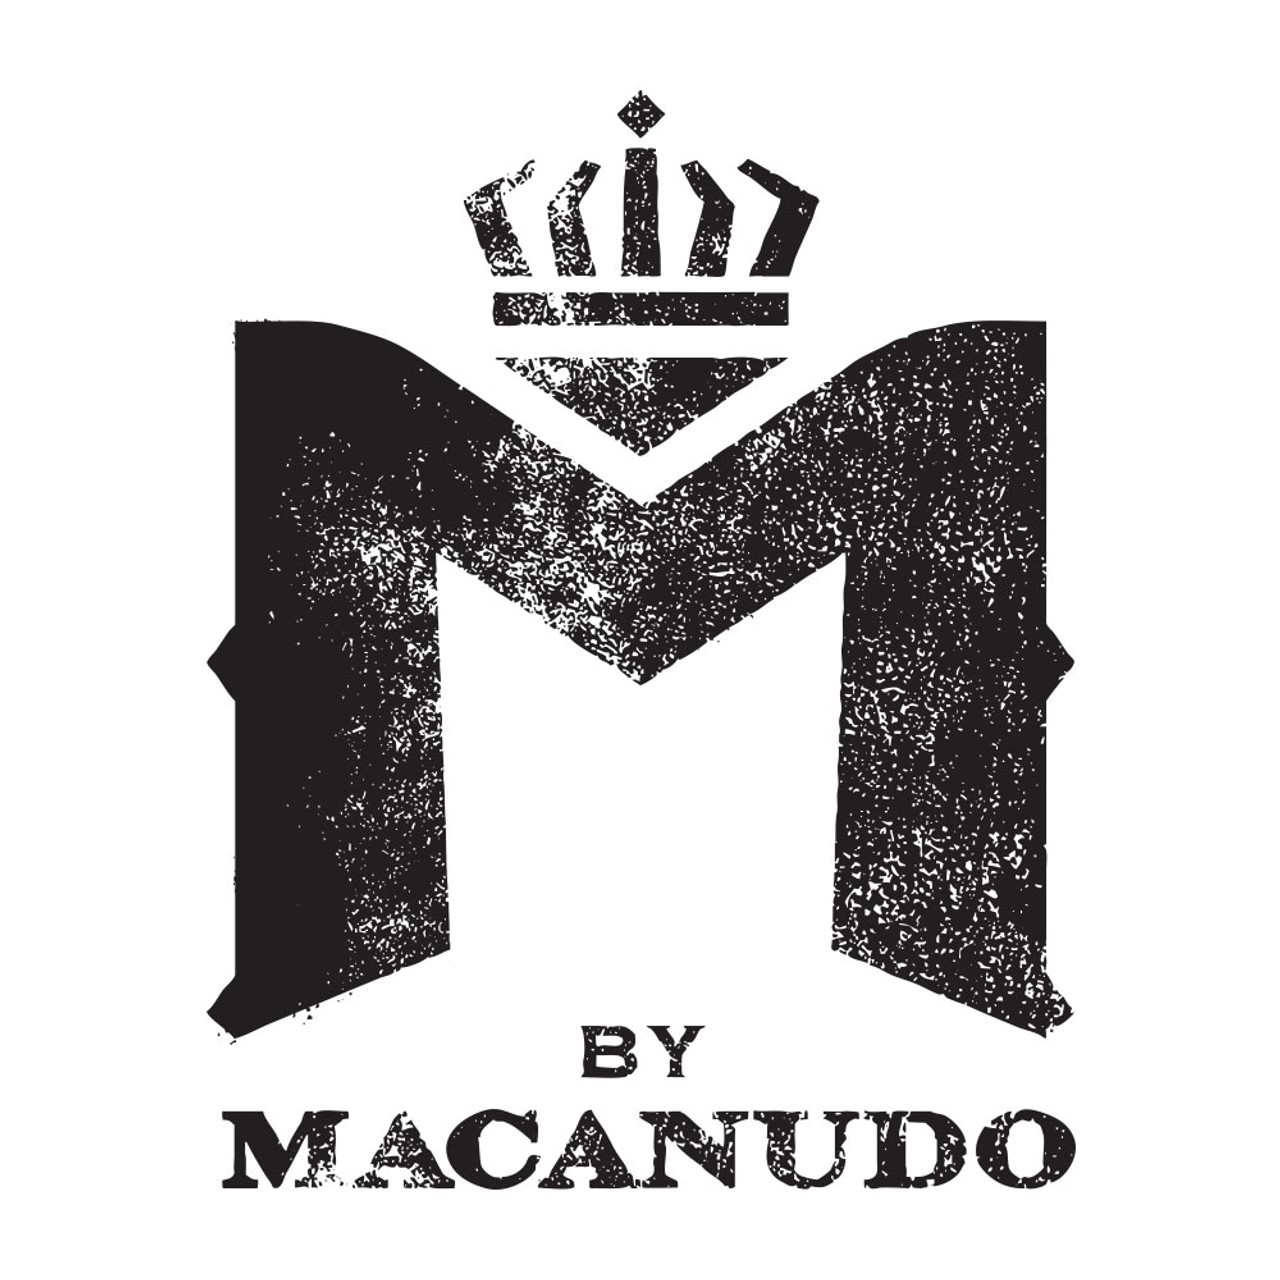 Macanudo M Toro Cigars - 6 x 50 (Box of 20)